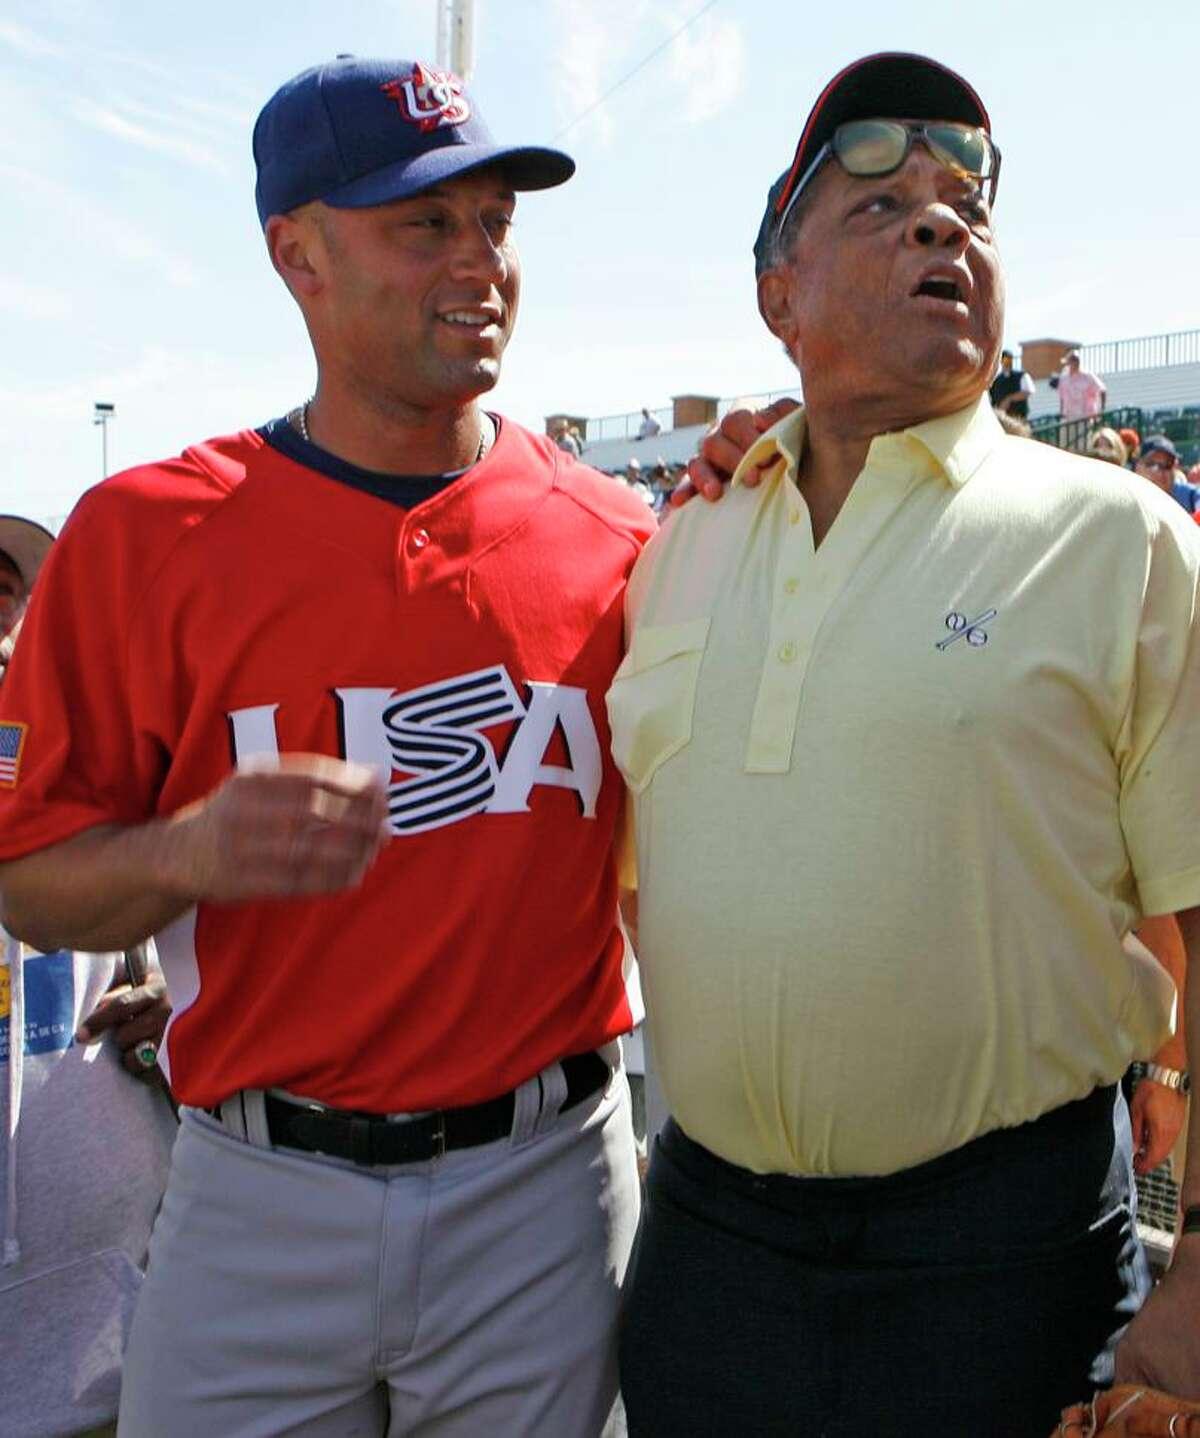 Derek Jeter (left) met Willie Mays for the first time in 2006 at Scottsdale Stadium in Arizona.